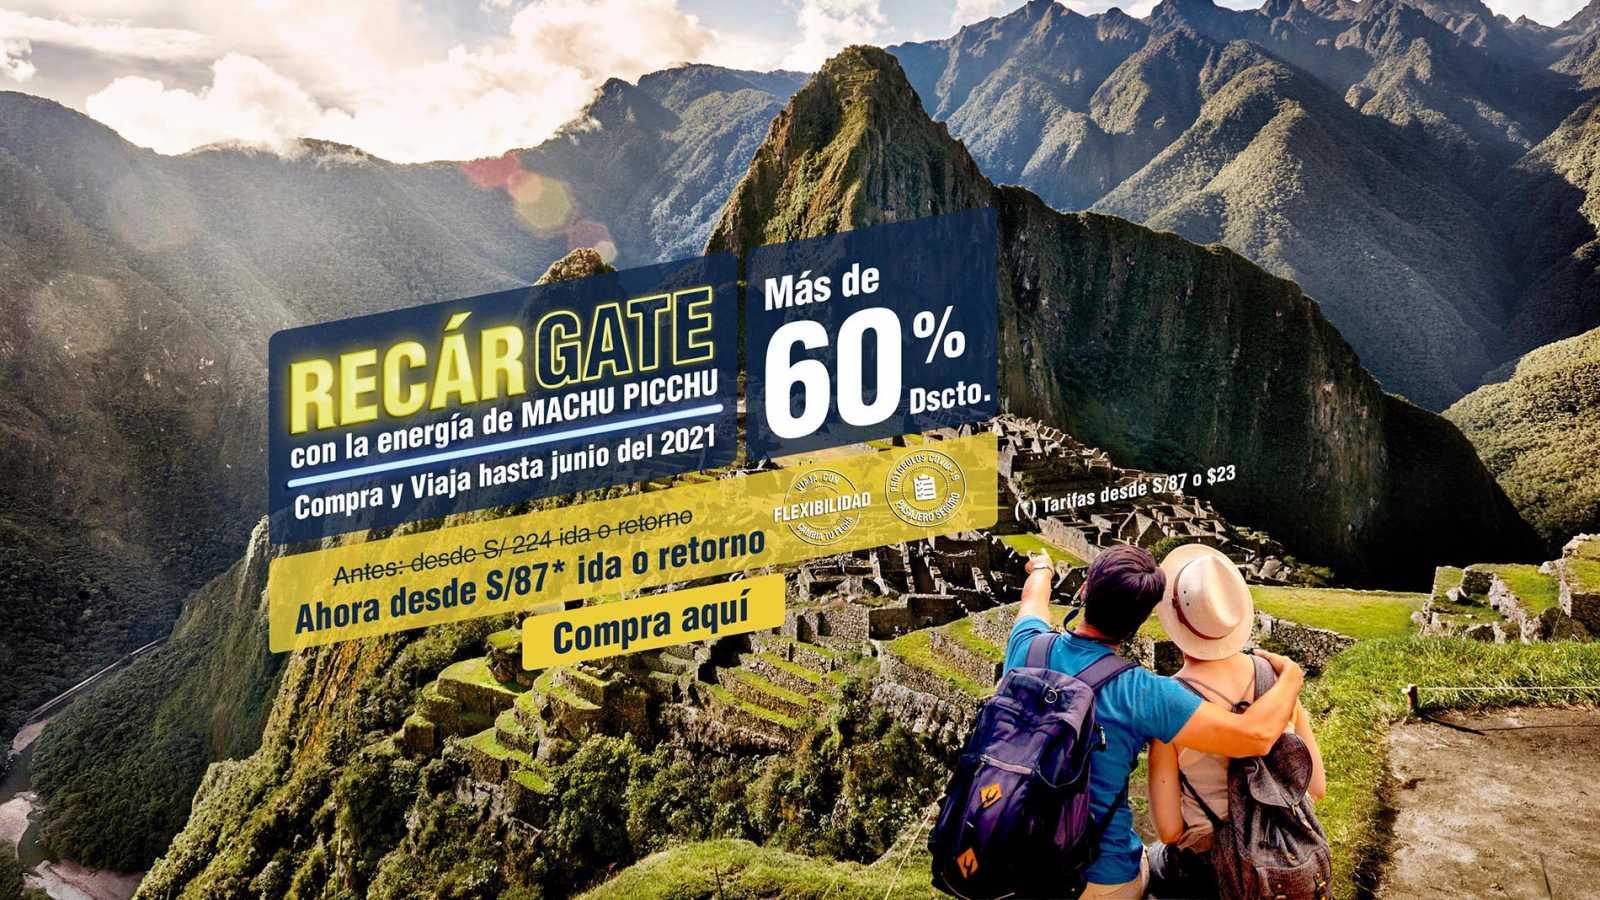 Paquetes Y Viajes Machu Picchu